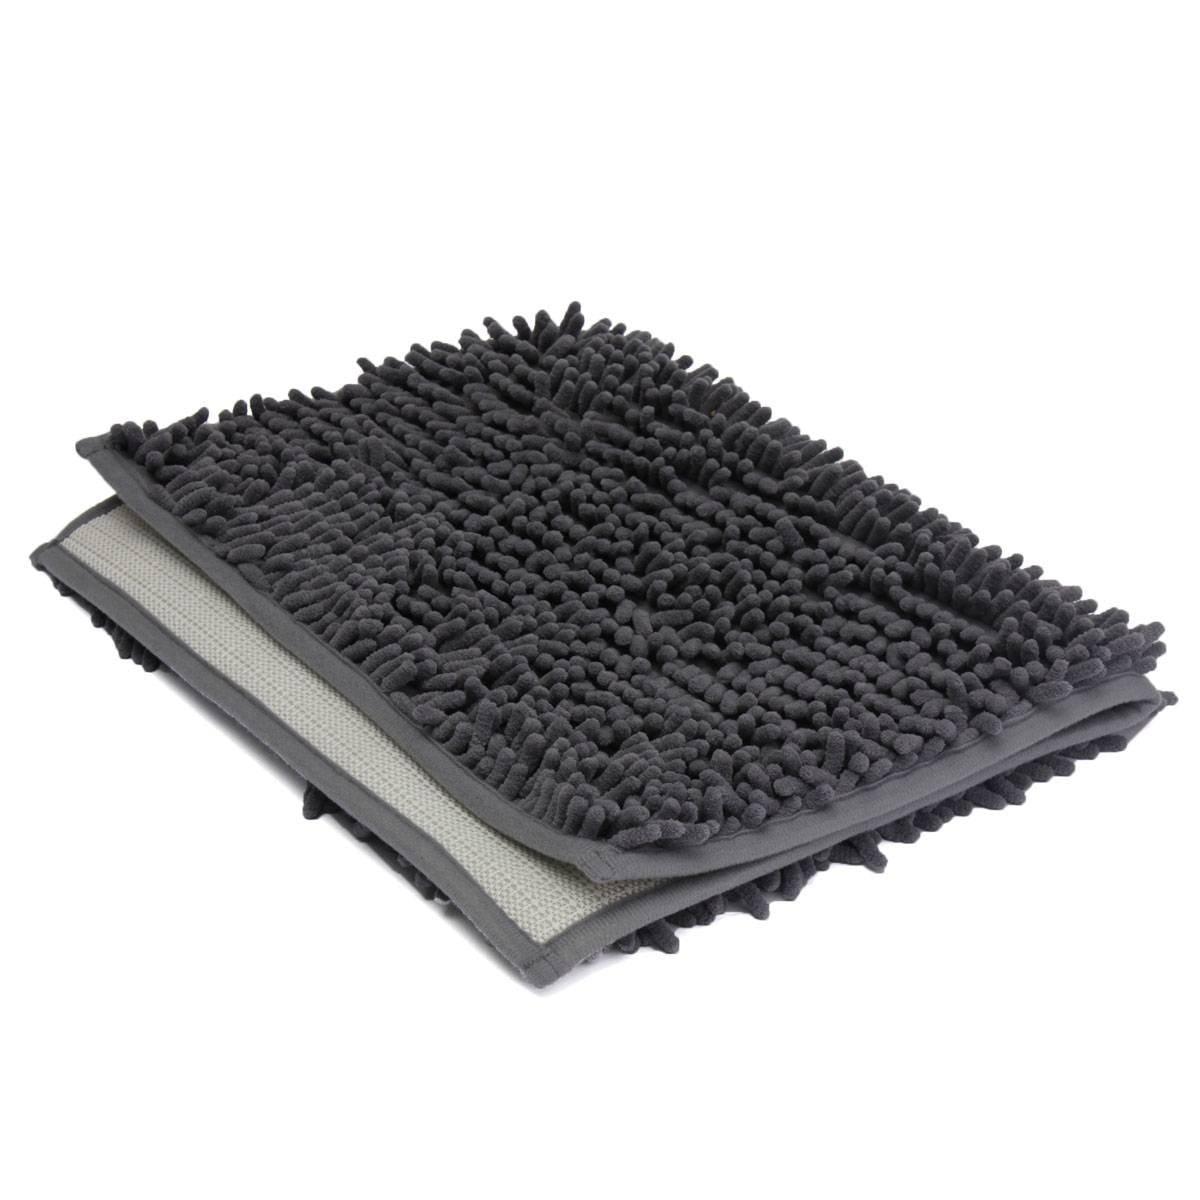 Thick Bathroom Rugs Online Get Cheap Gray Bath Rug Aliexpresscom Alibaba Group